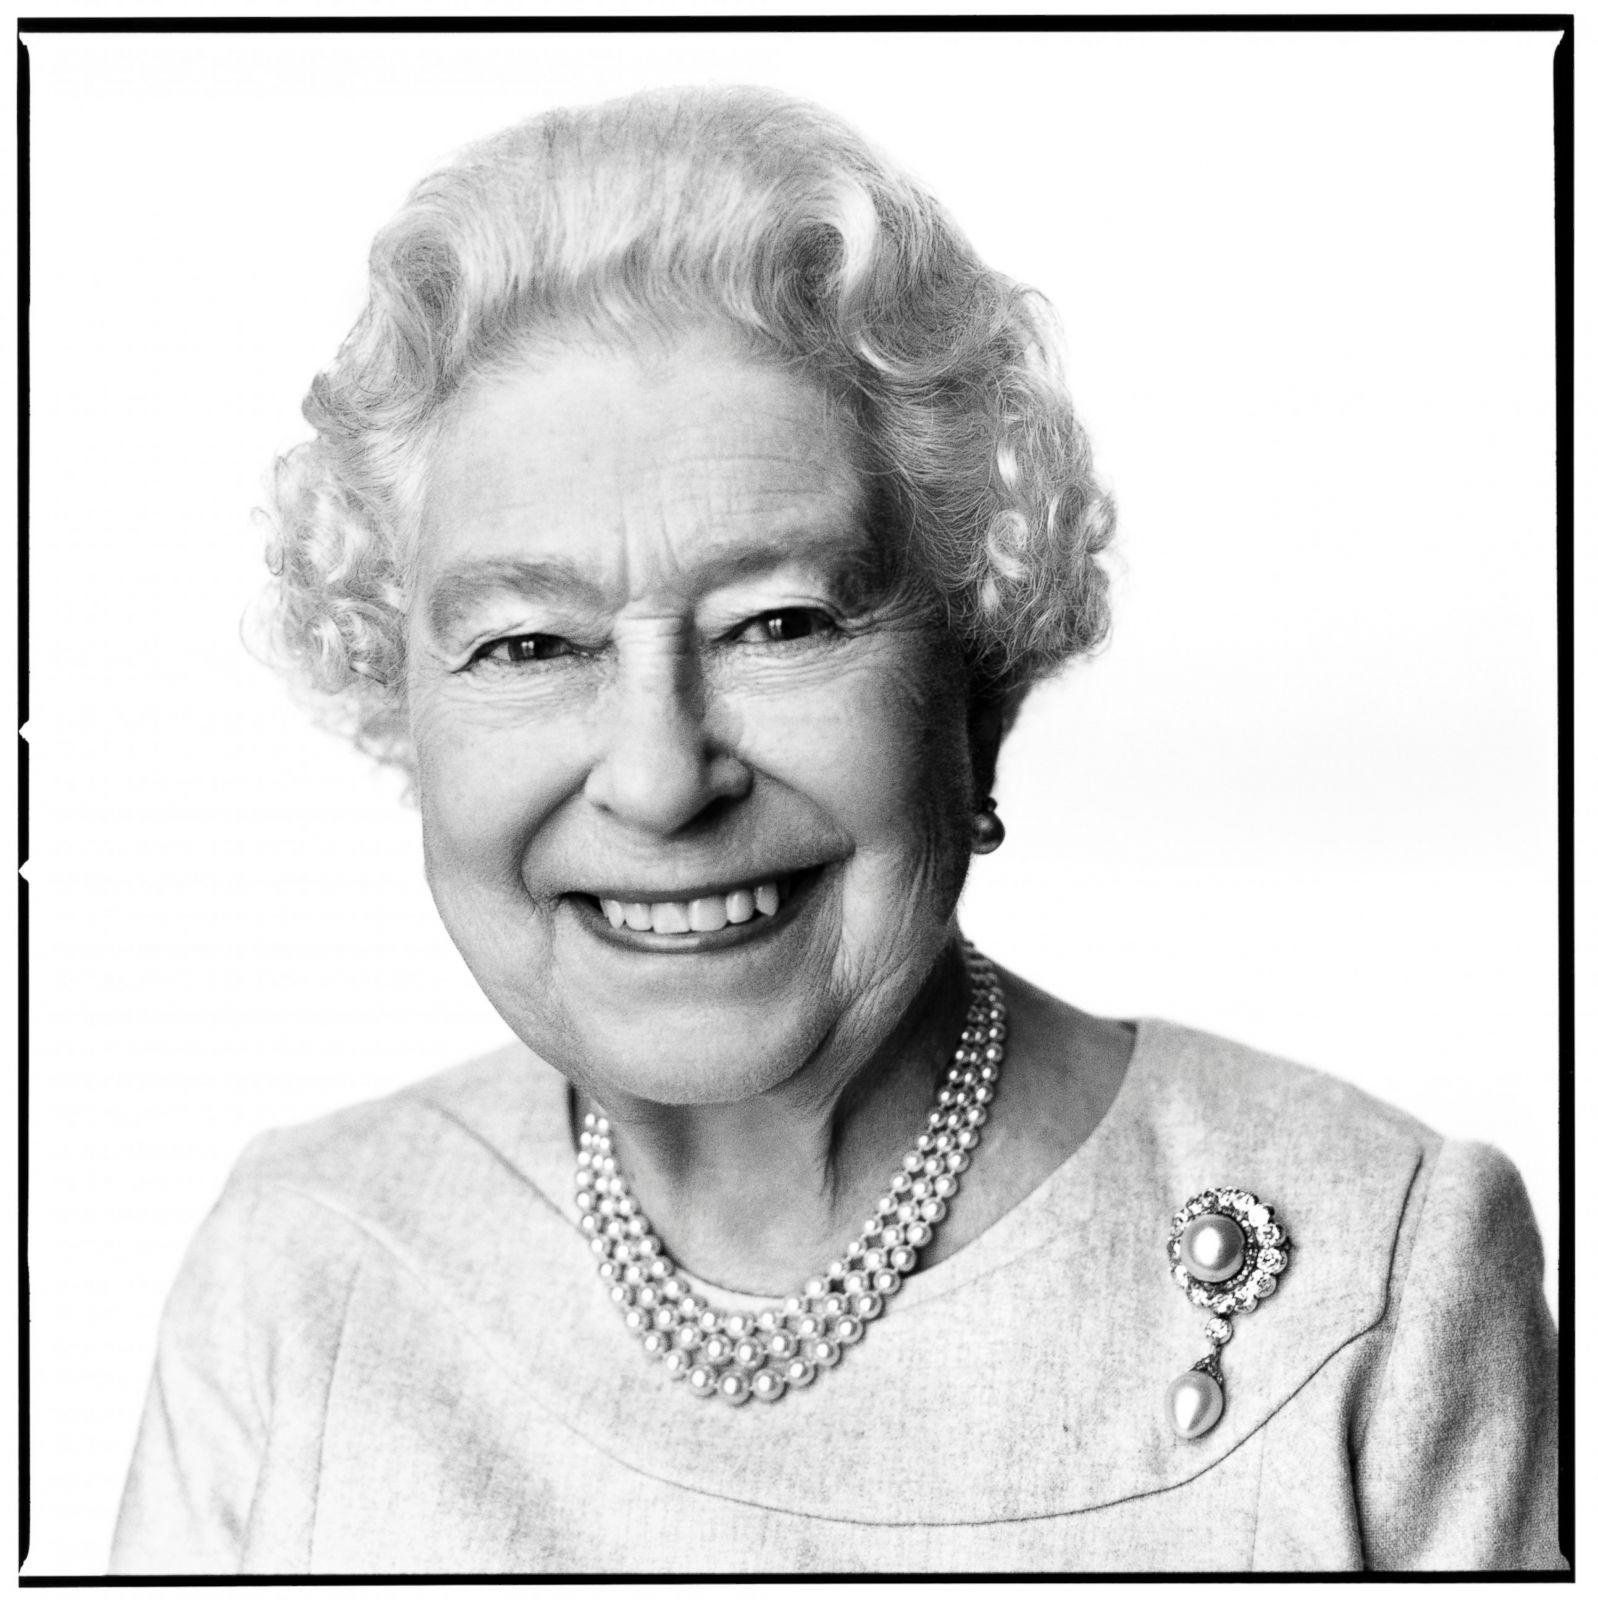 Queen Elizabeth Ii S Life Through The Years Photos Abc News